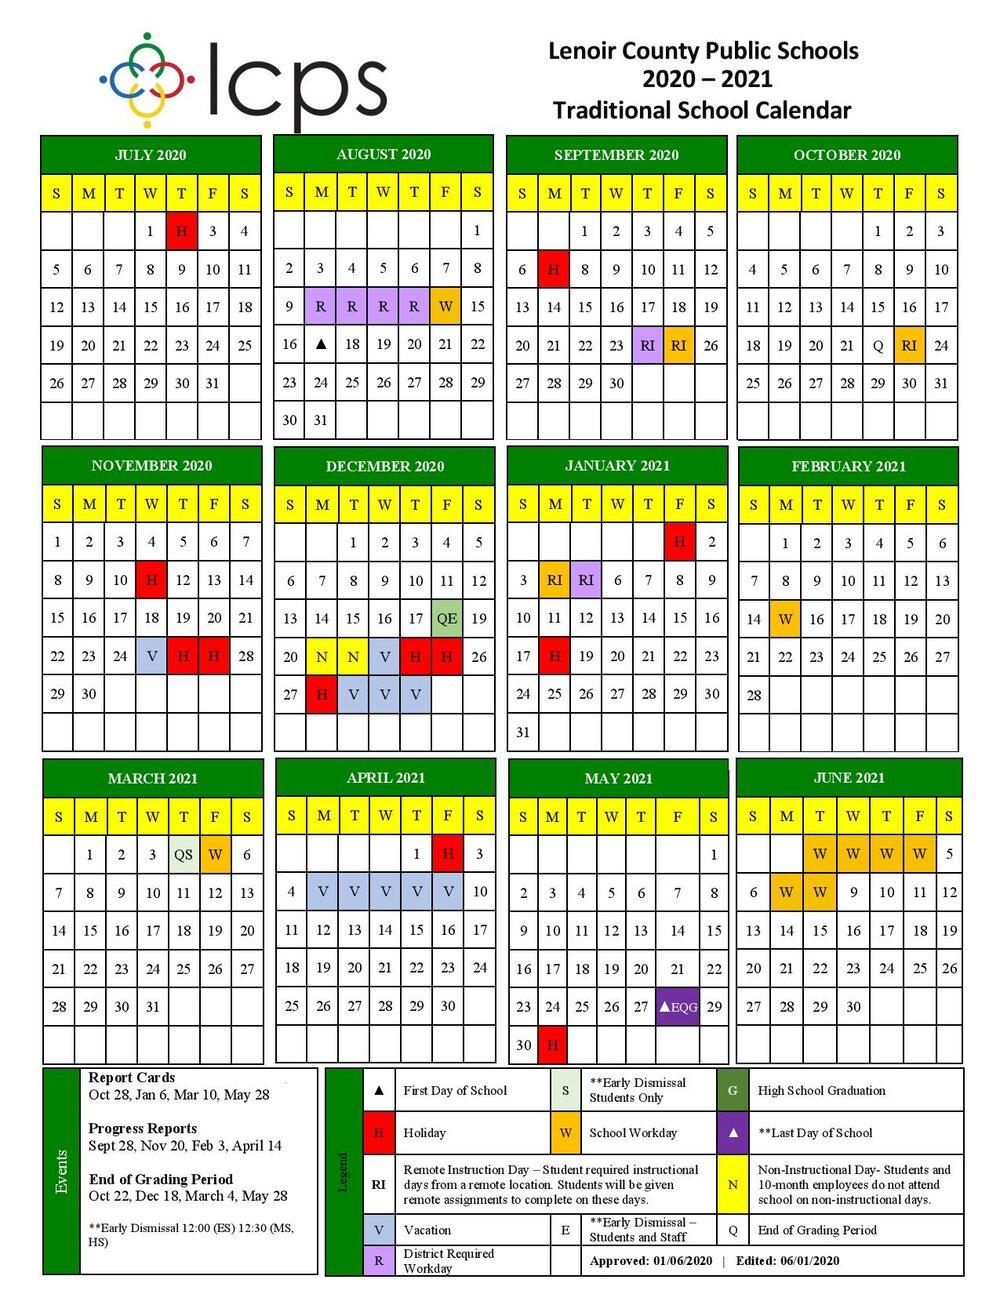 Lenoir County Public Schools Releases The Revised 2020-2021 for Lenoir County 2021 2021 School Calendar